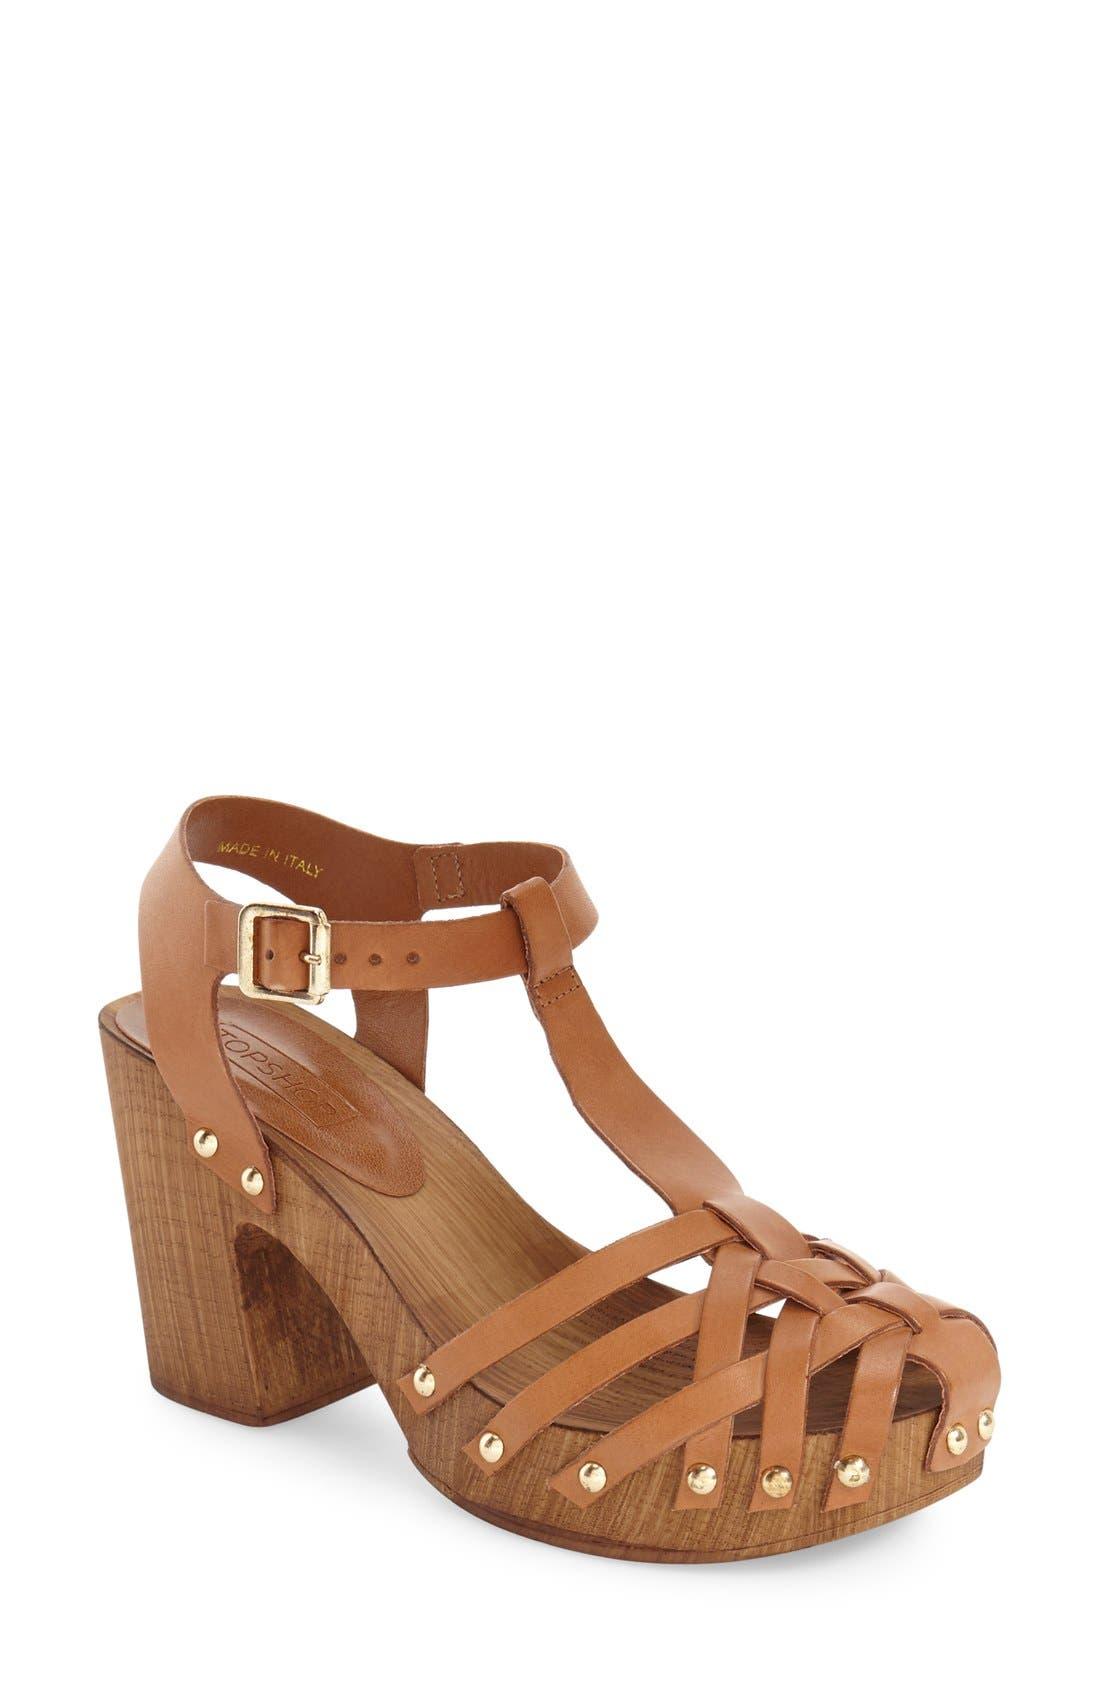 Alternate Image 1 Selected - Topshop 'Venice' Platform Sandal (Women)